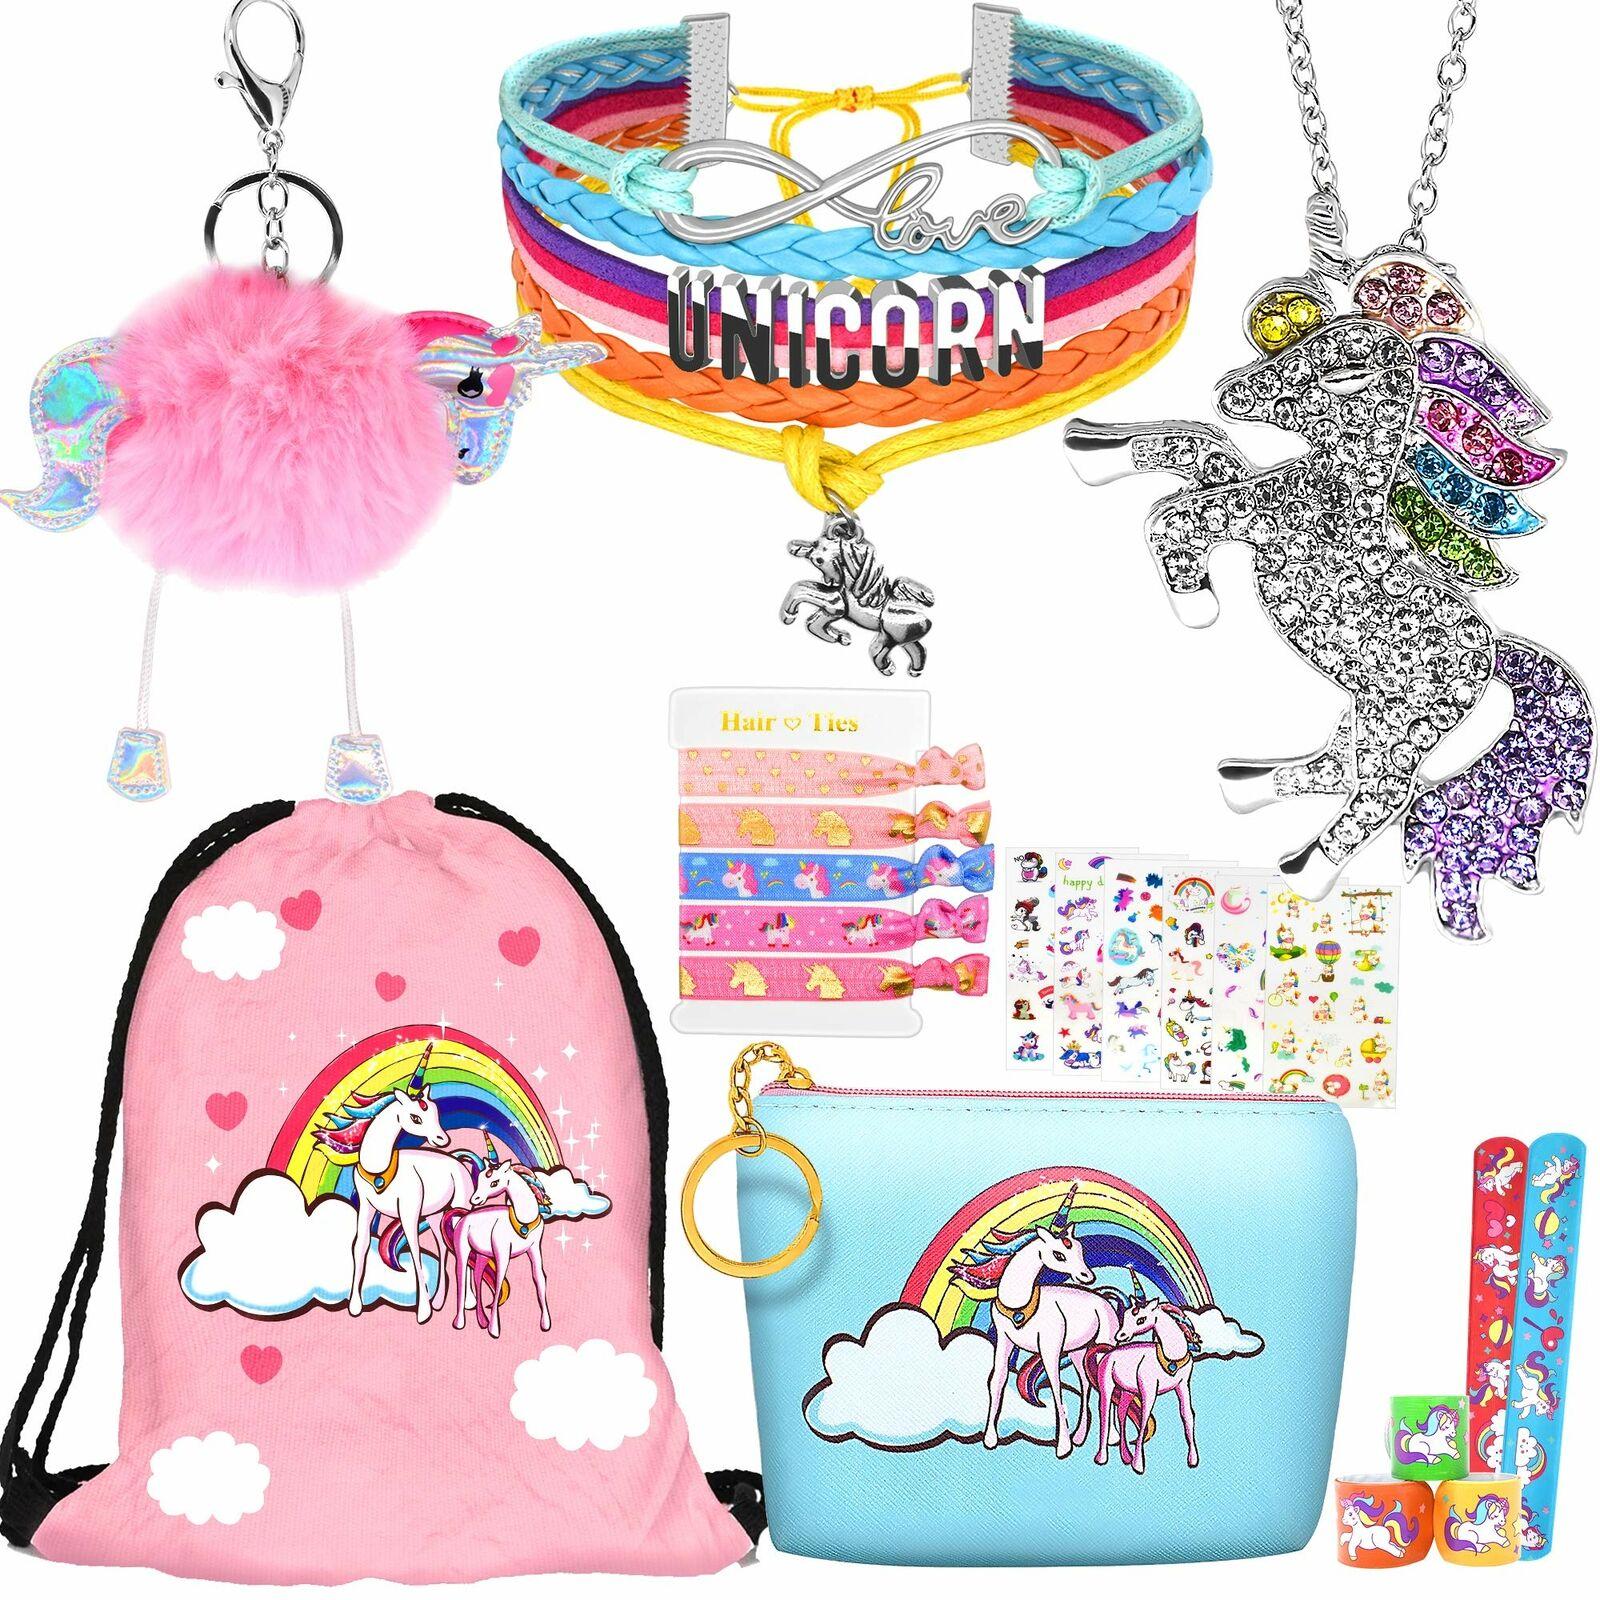 Unicorn Bracelet for Girls Unicorn Jewelry for Women and Bangle Size Personalized Initial Birthstone Personalized Unicorn Gifts for Girls